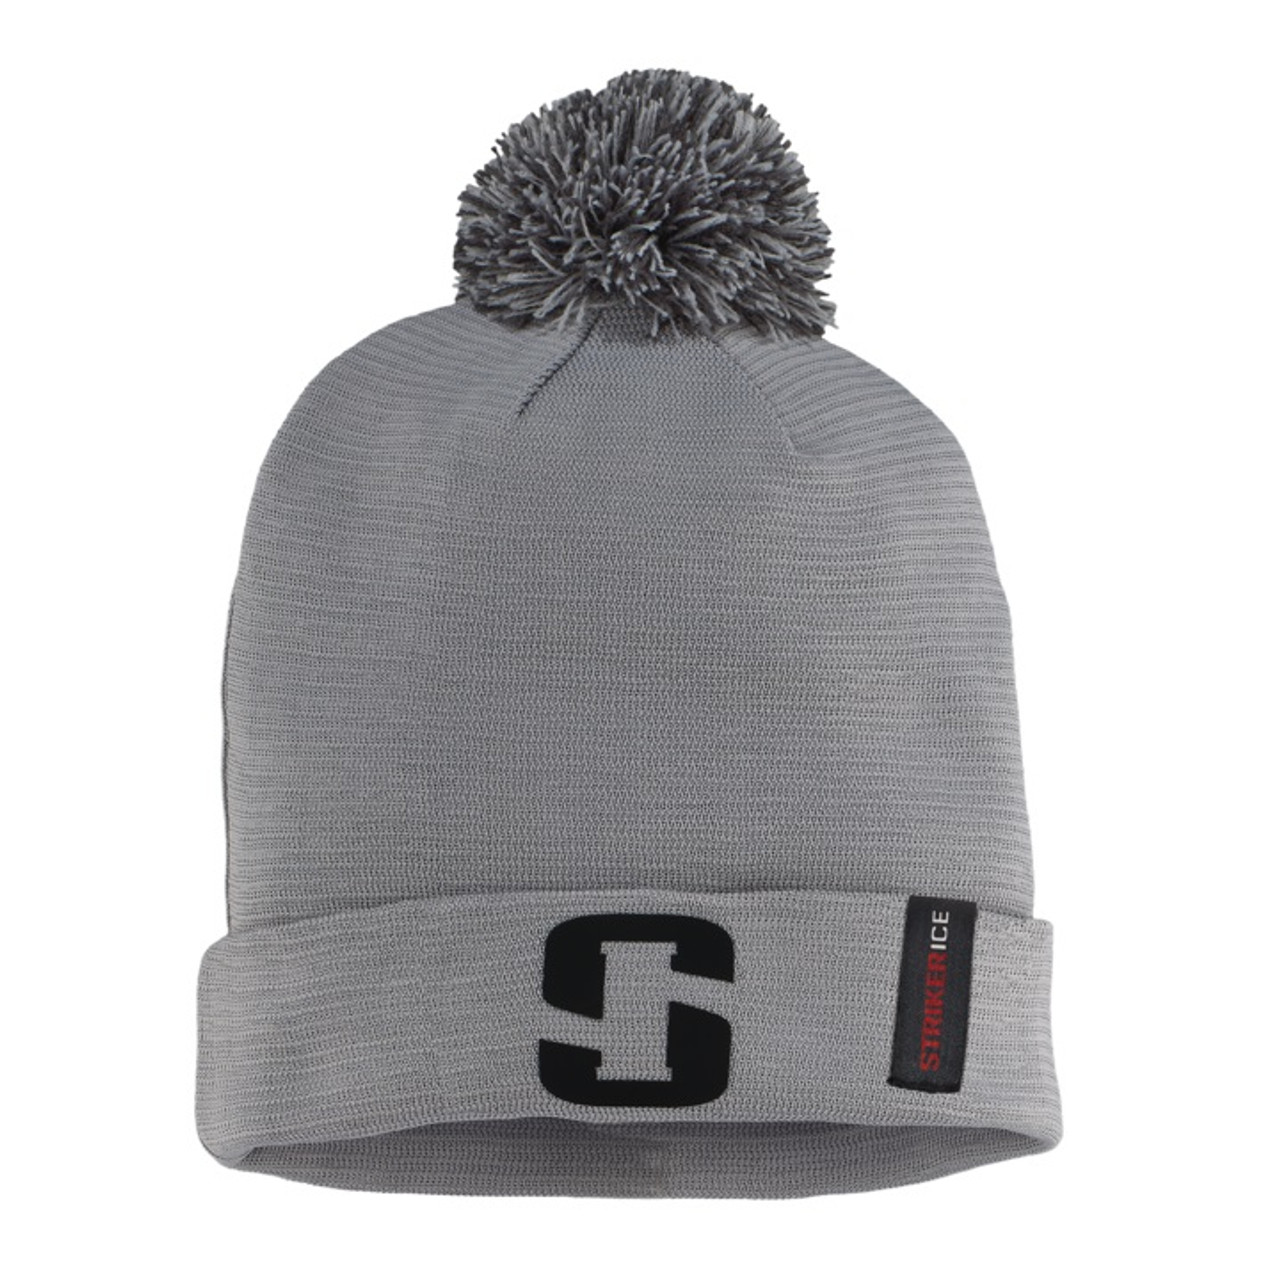 Striker Ice AntiFreeze Ice Fishing Hat